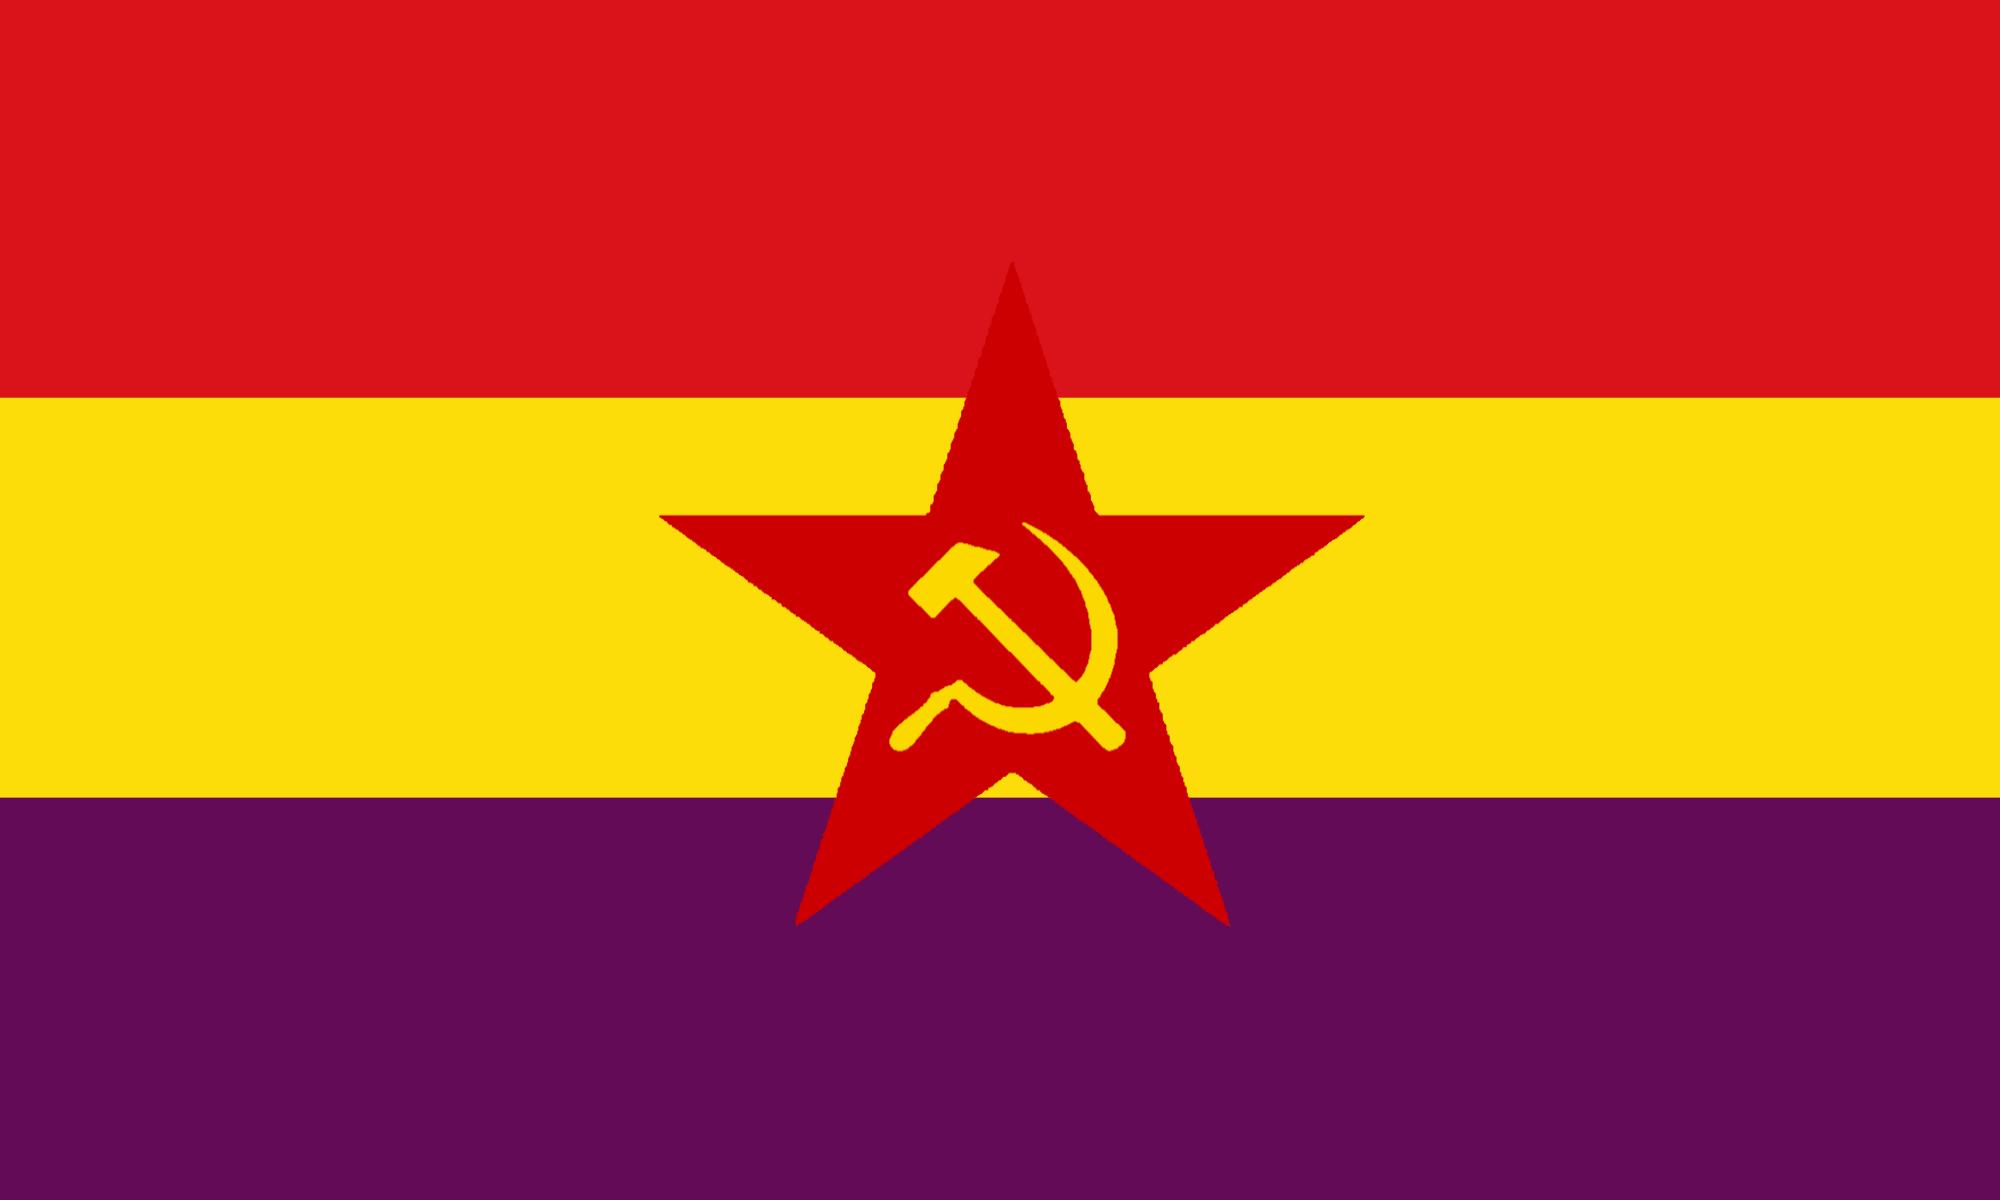 image people u0027s republic of spain flag png alternative history